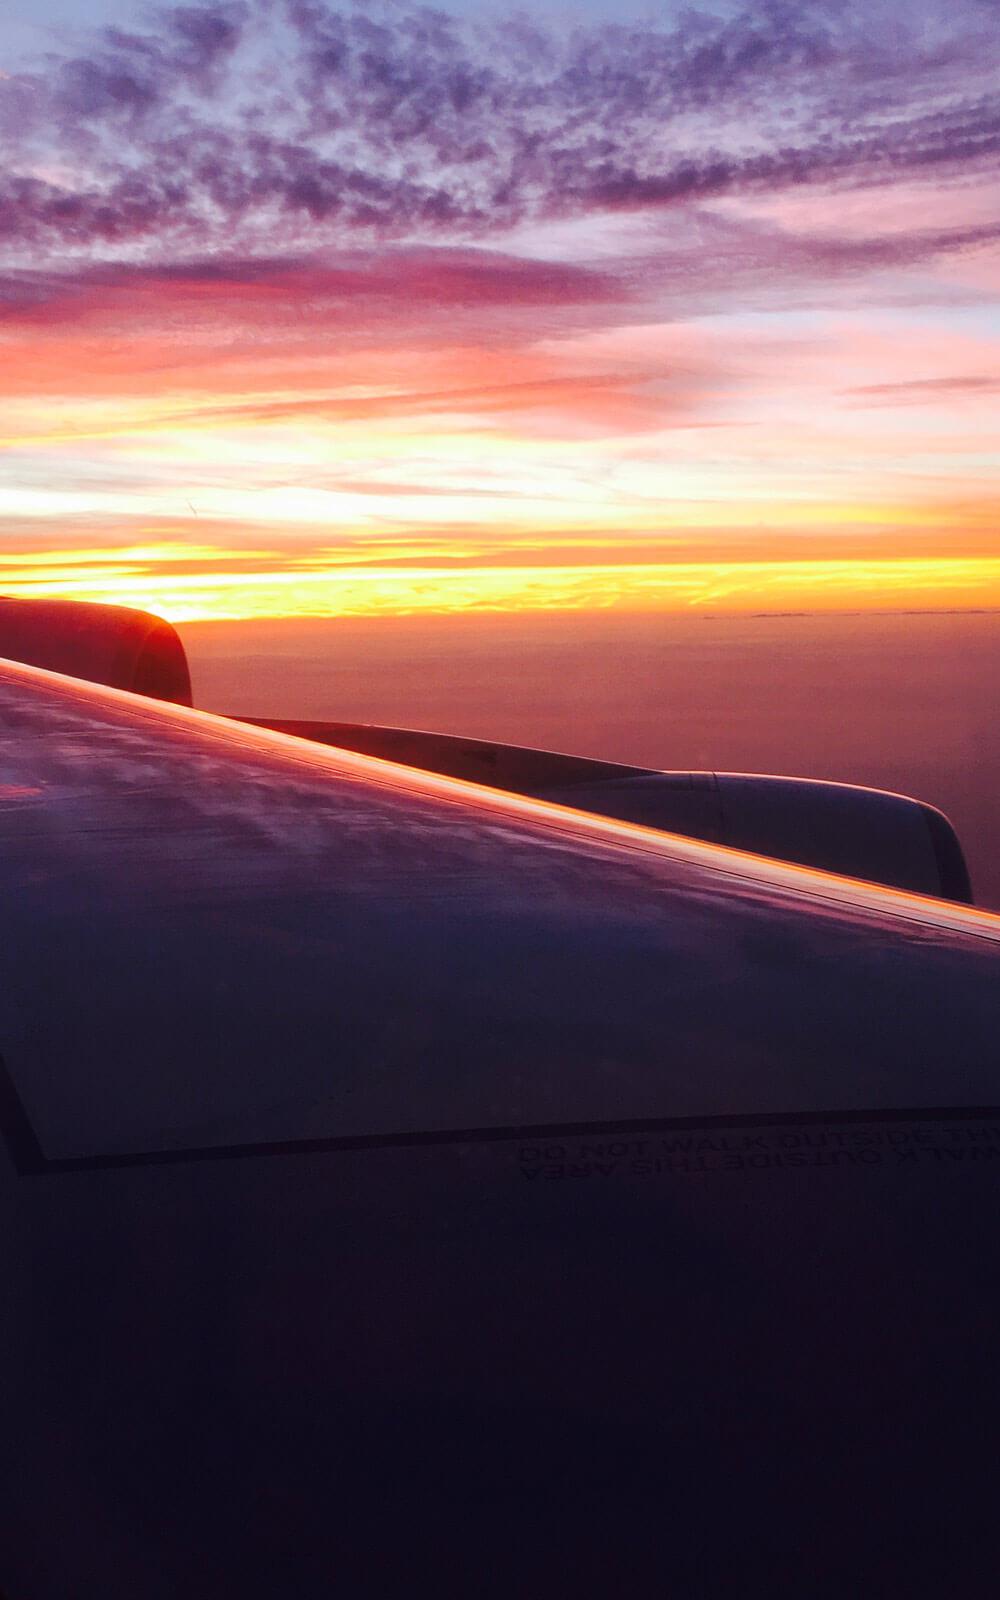 Sonnenuntergang aus dem Flugzeug